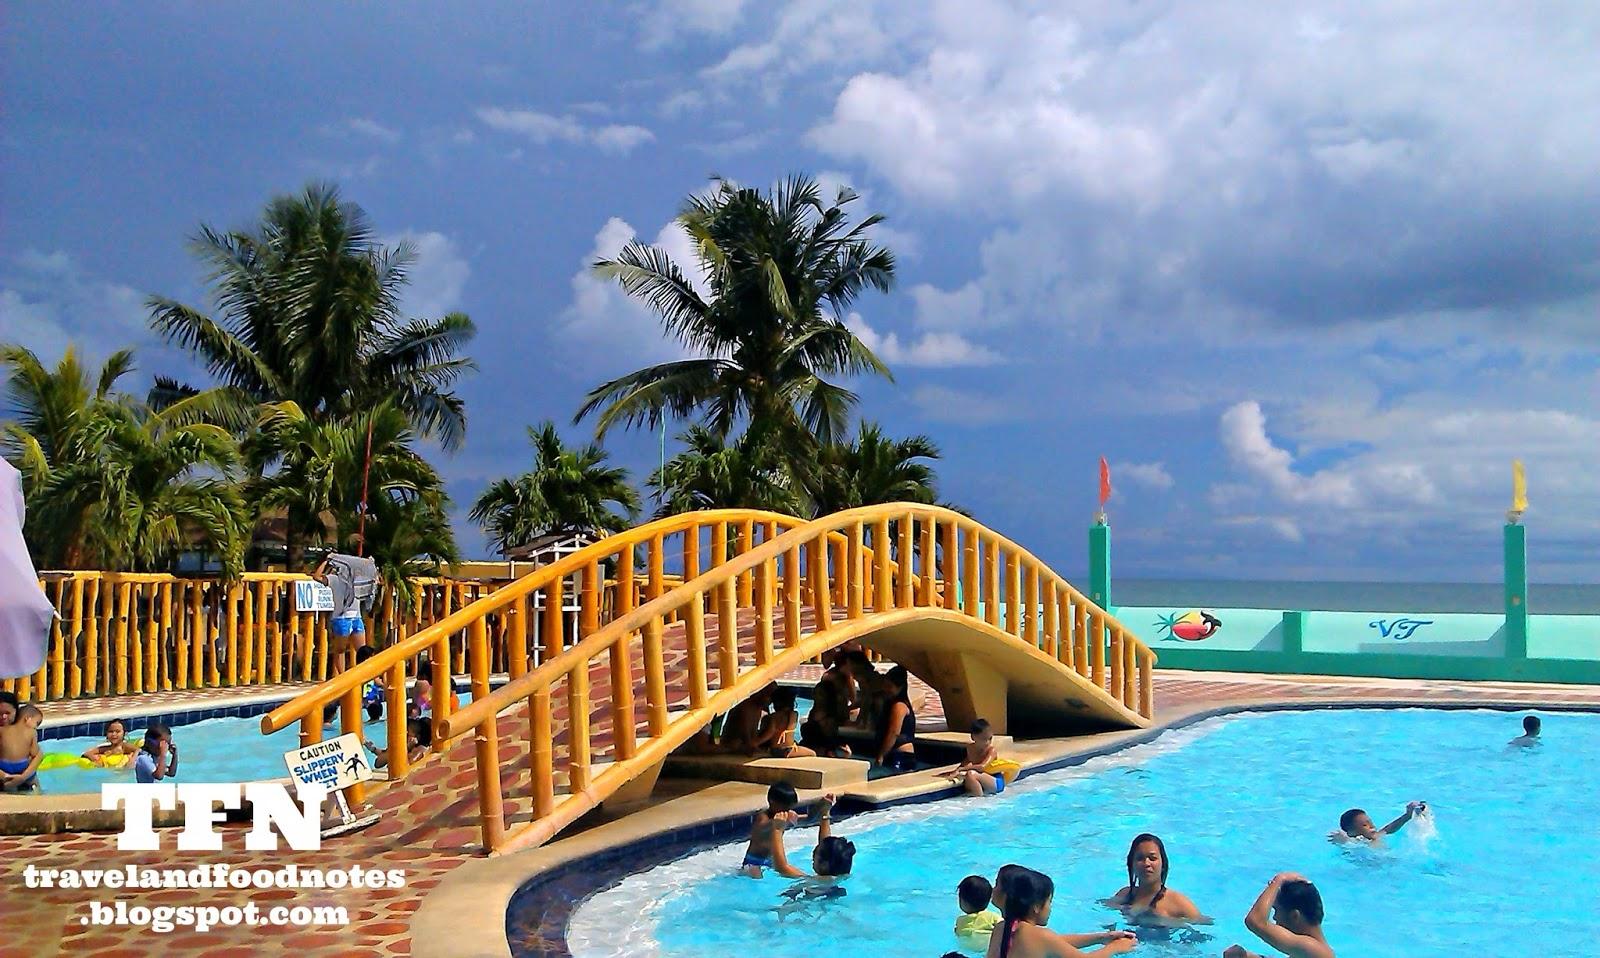 Splendid Holiday Spent In Villa Teresita Resort At Talisay City Cebu The Biyahero